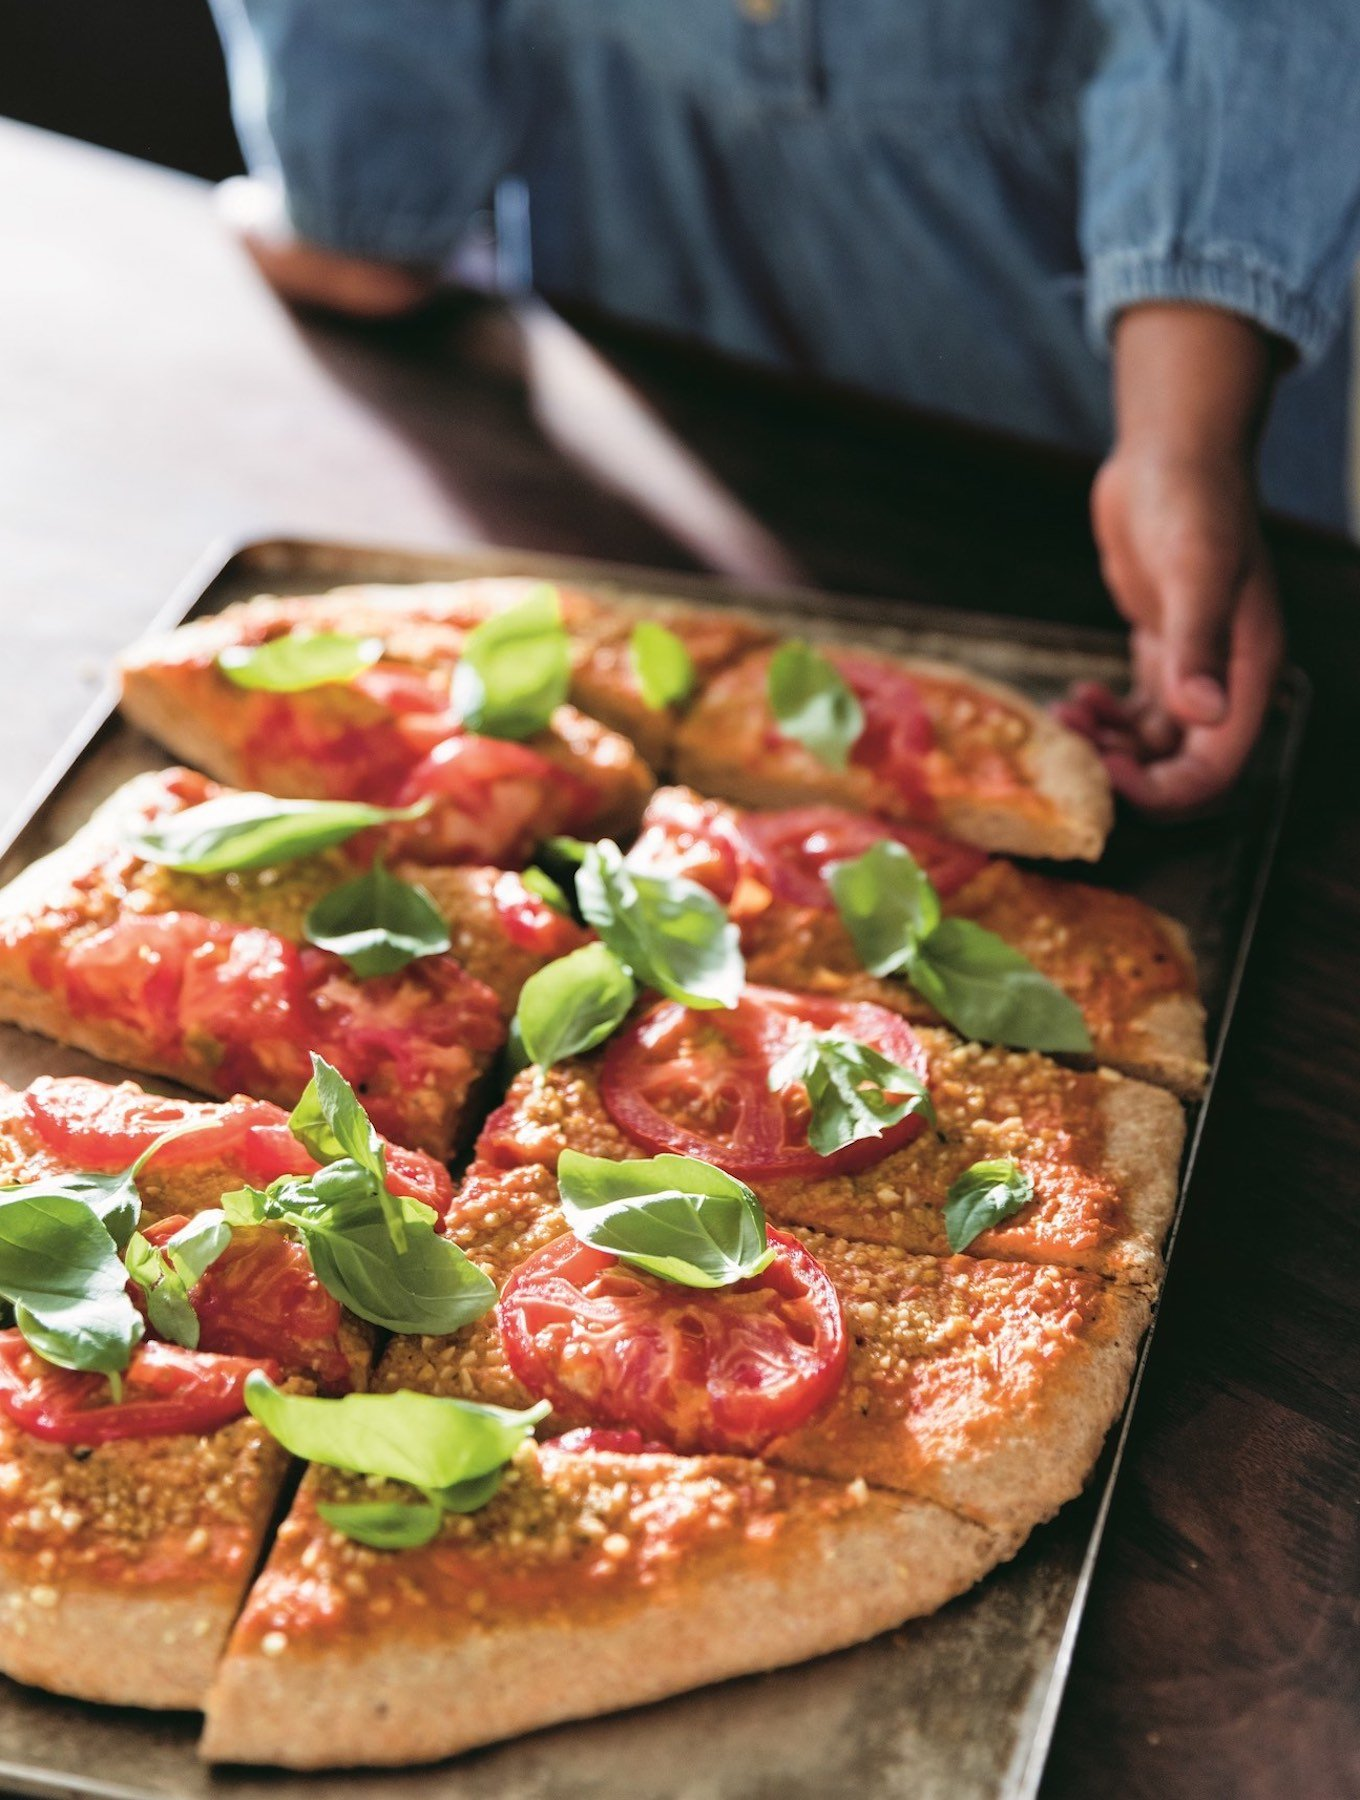 Vegan Spelt crust pizza with fresh tomato sauce